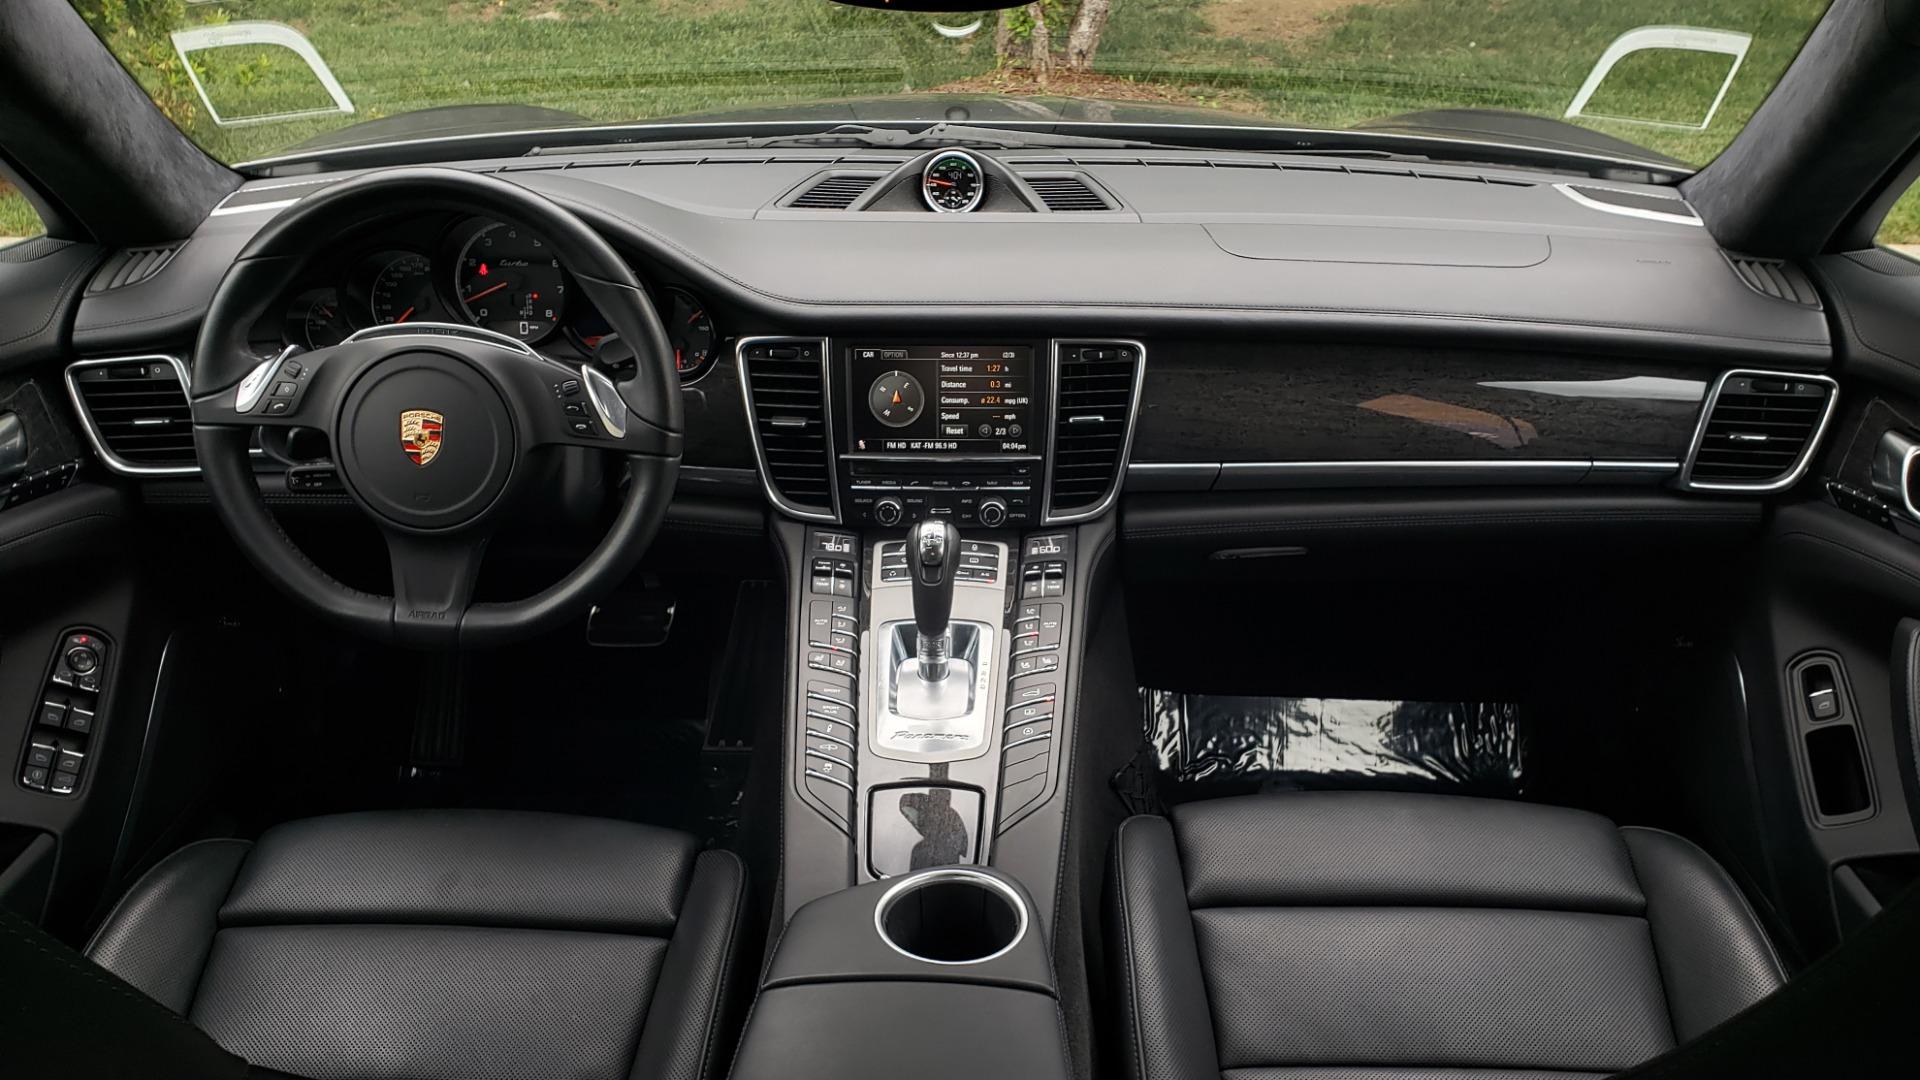 Used 2013 Porsche PANAMERA TURBO 4.8L V8 / AWD / NAV / SUNROOF / LCA / PARK ASST / BURMESTER for sale $45,995 at Formula Imports in Charlotte NC 28227 86